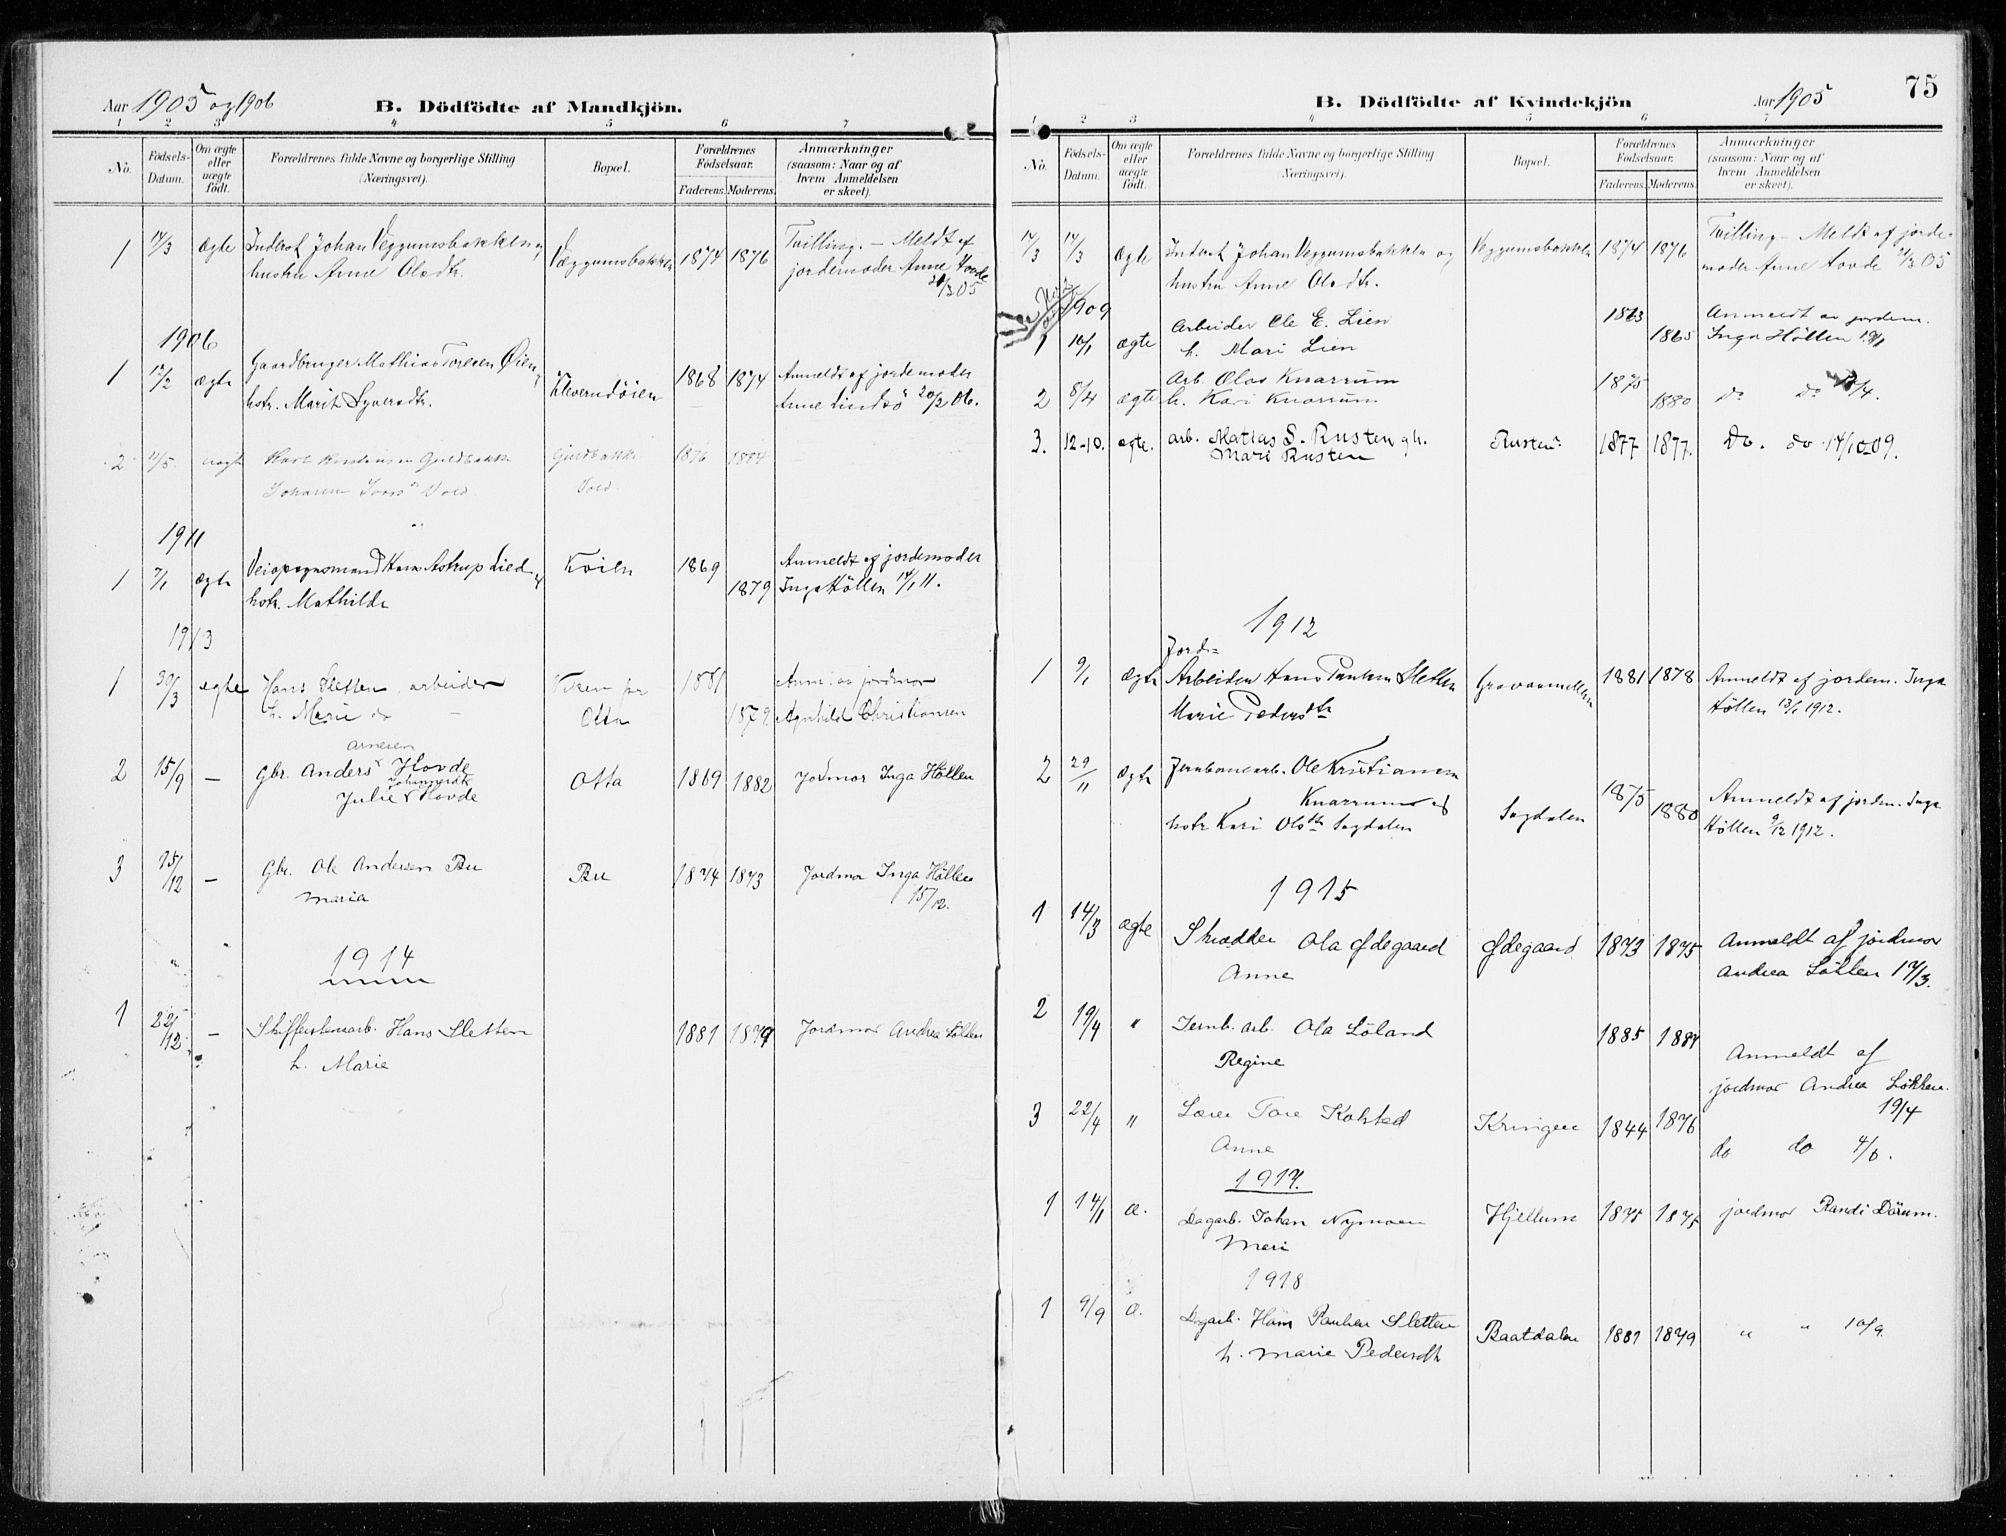 SAH, Sel prestekontor, Ministerialbok nr. 2, 1905-1919, s. 75